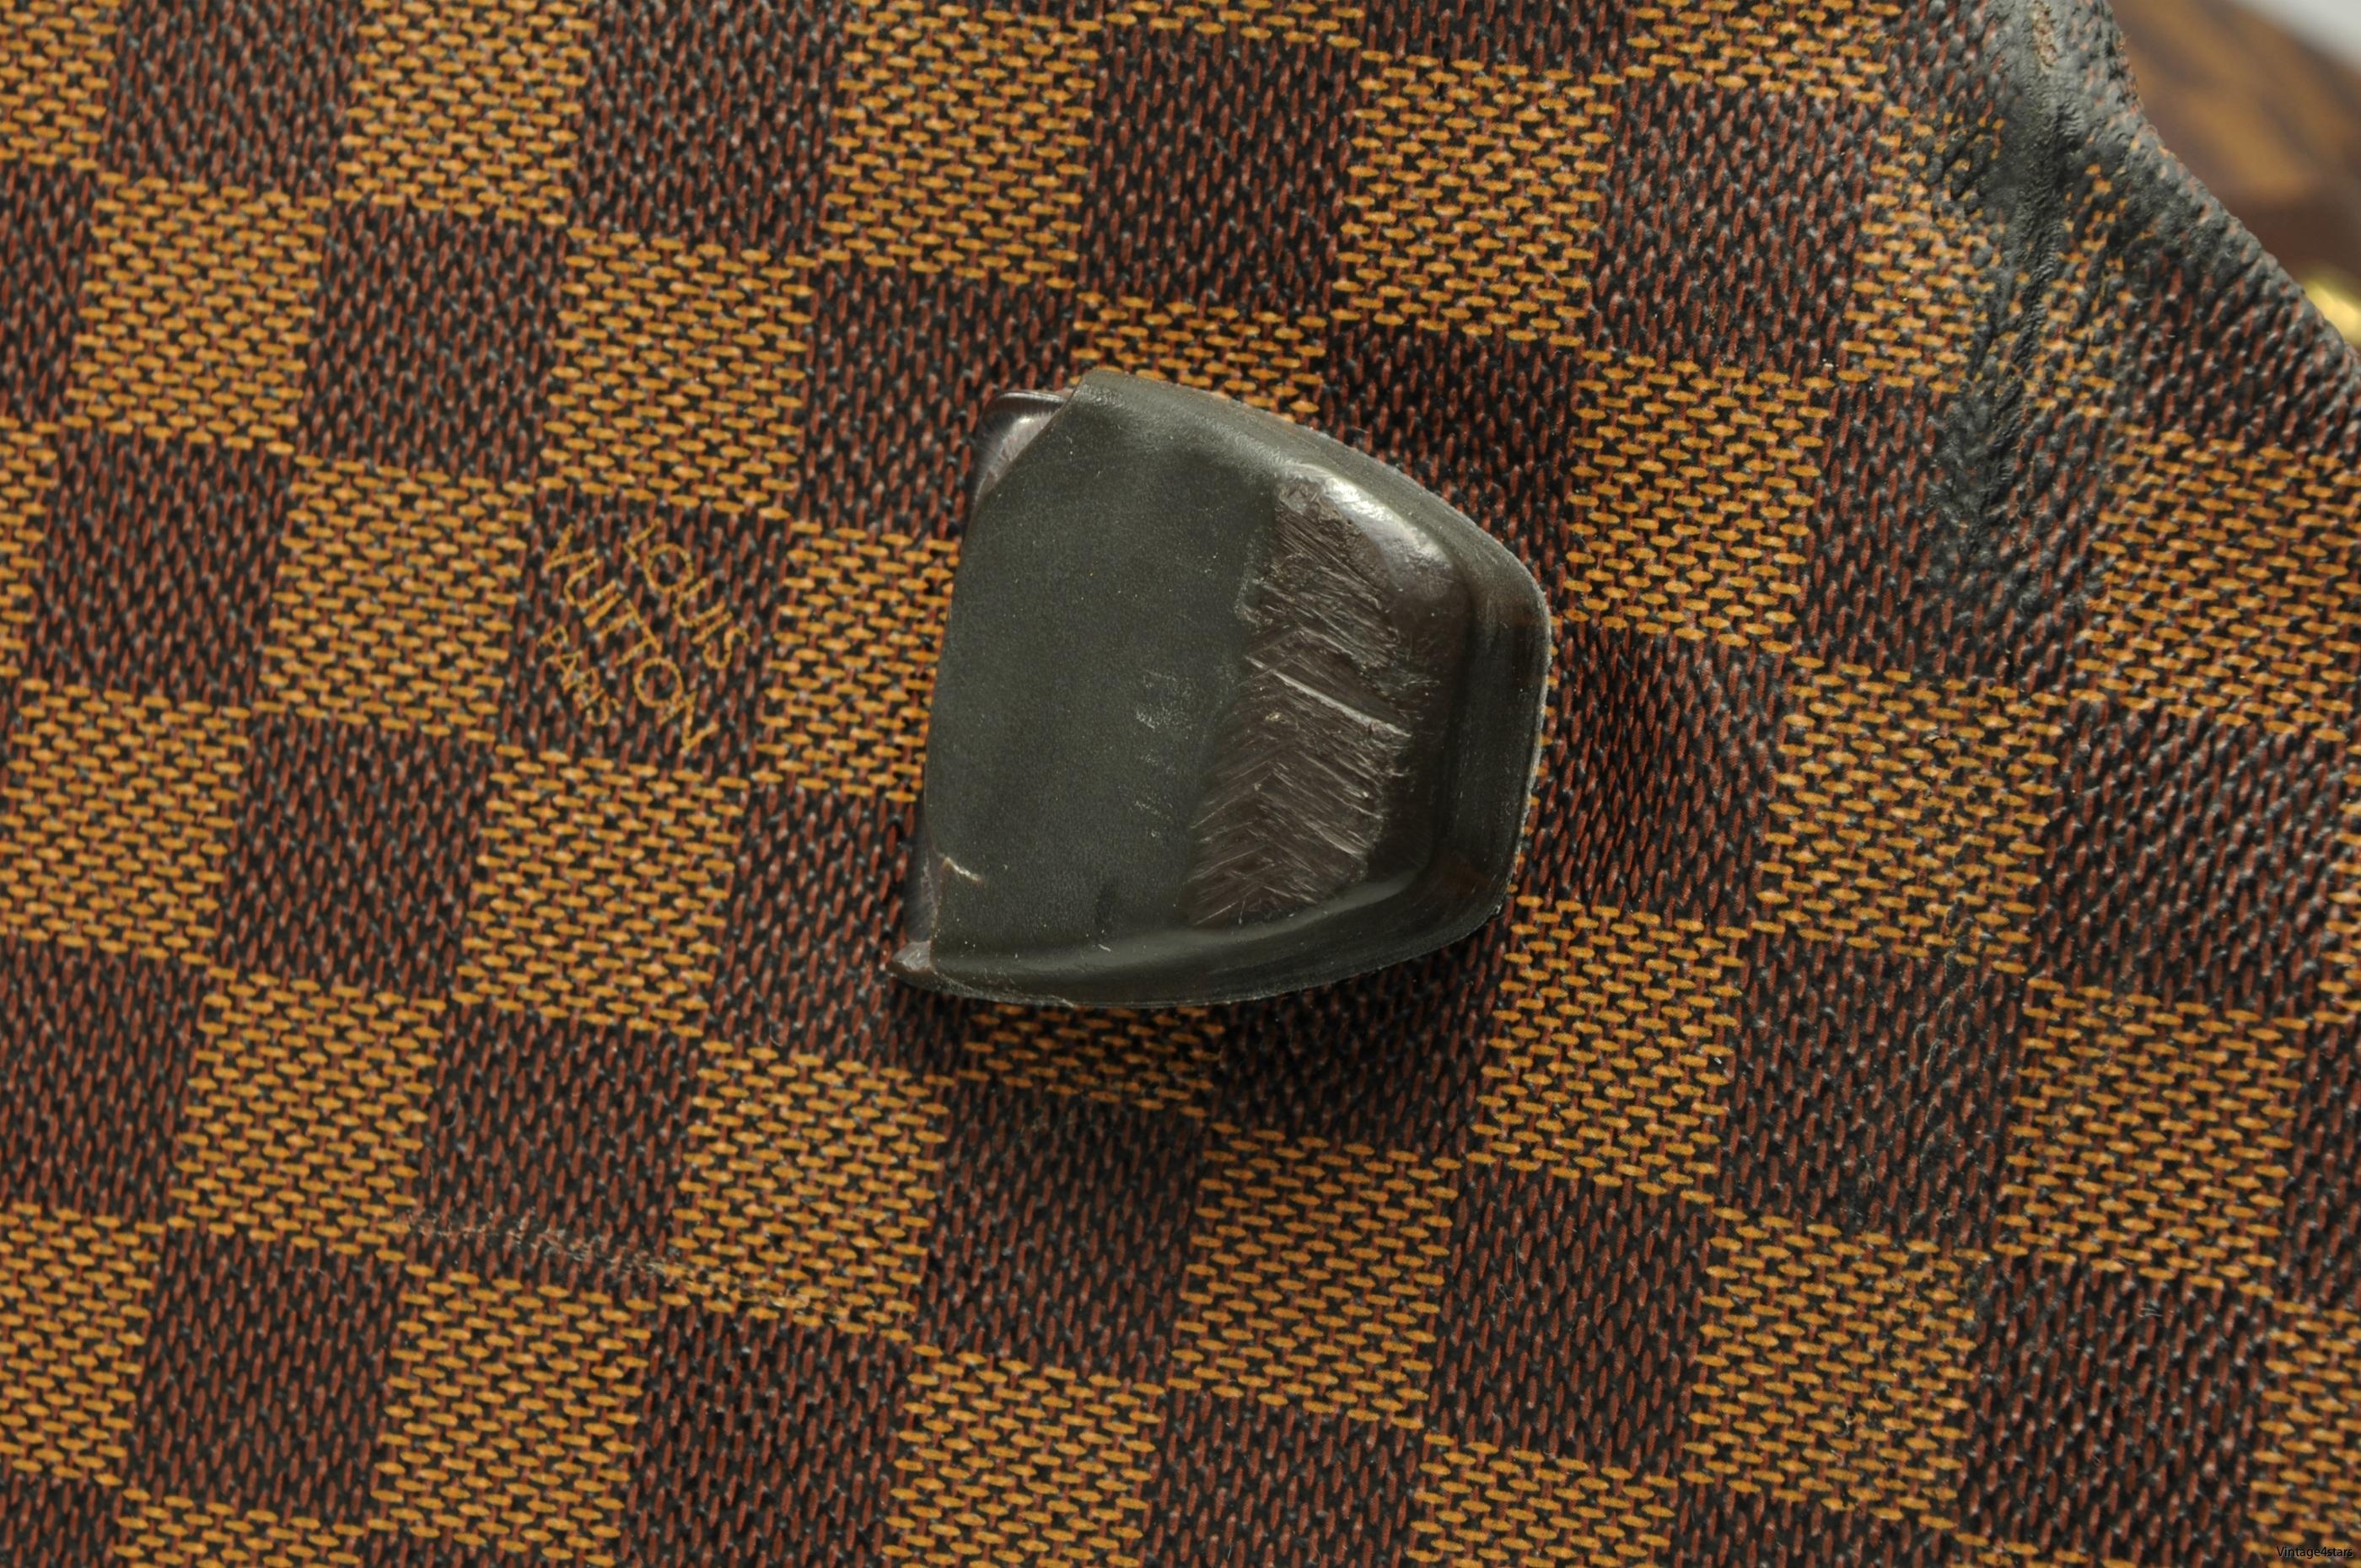 Louis Vuitton Eole 60 Damier Ebene 13